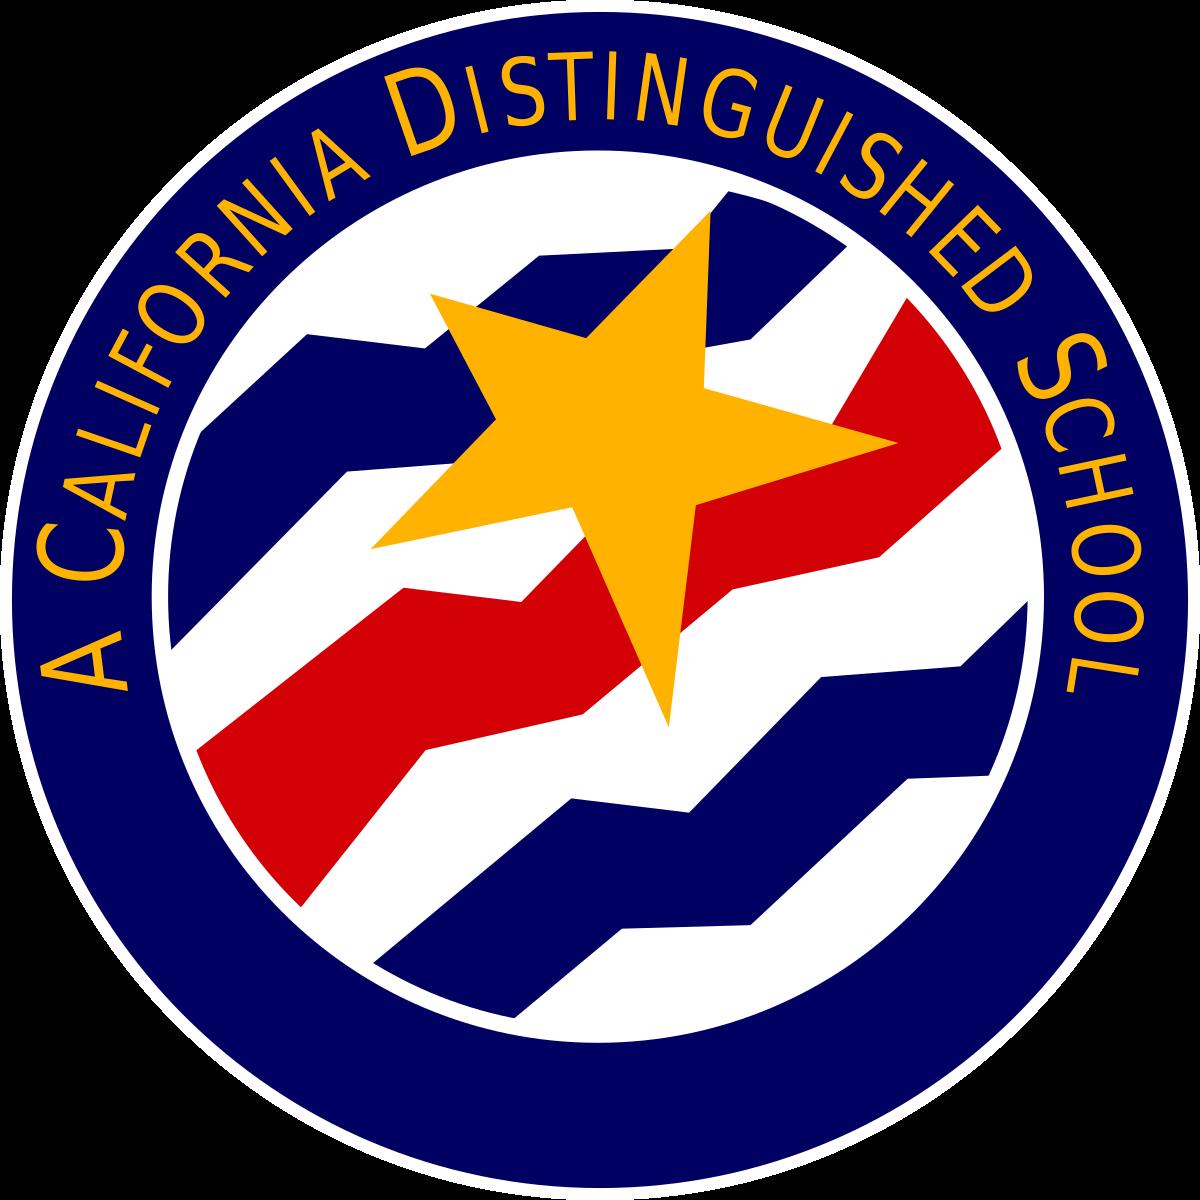 ca distinguished